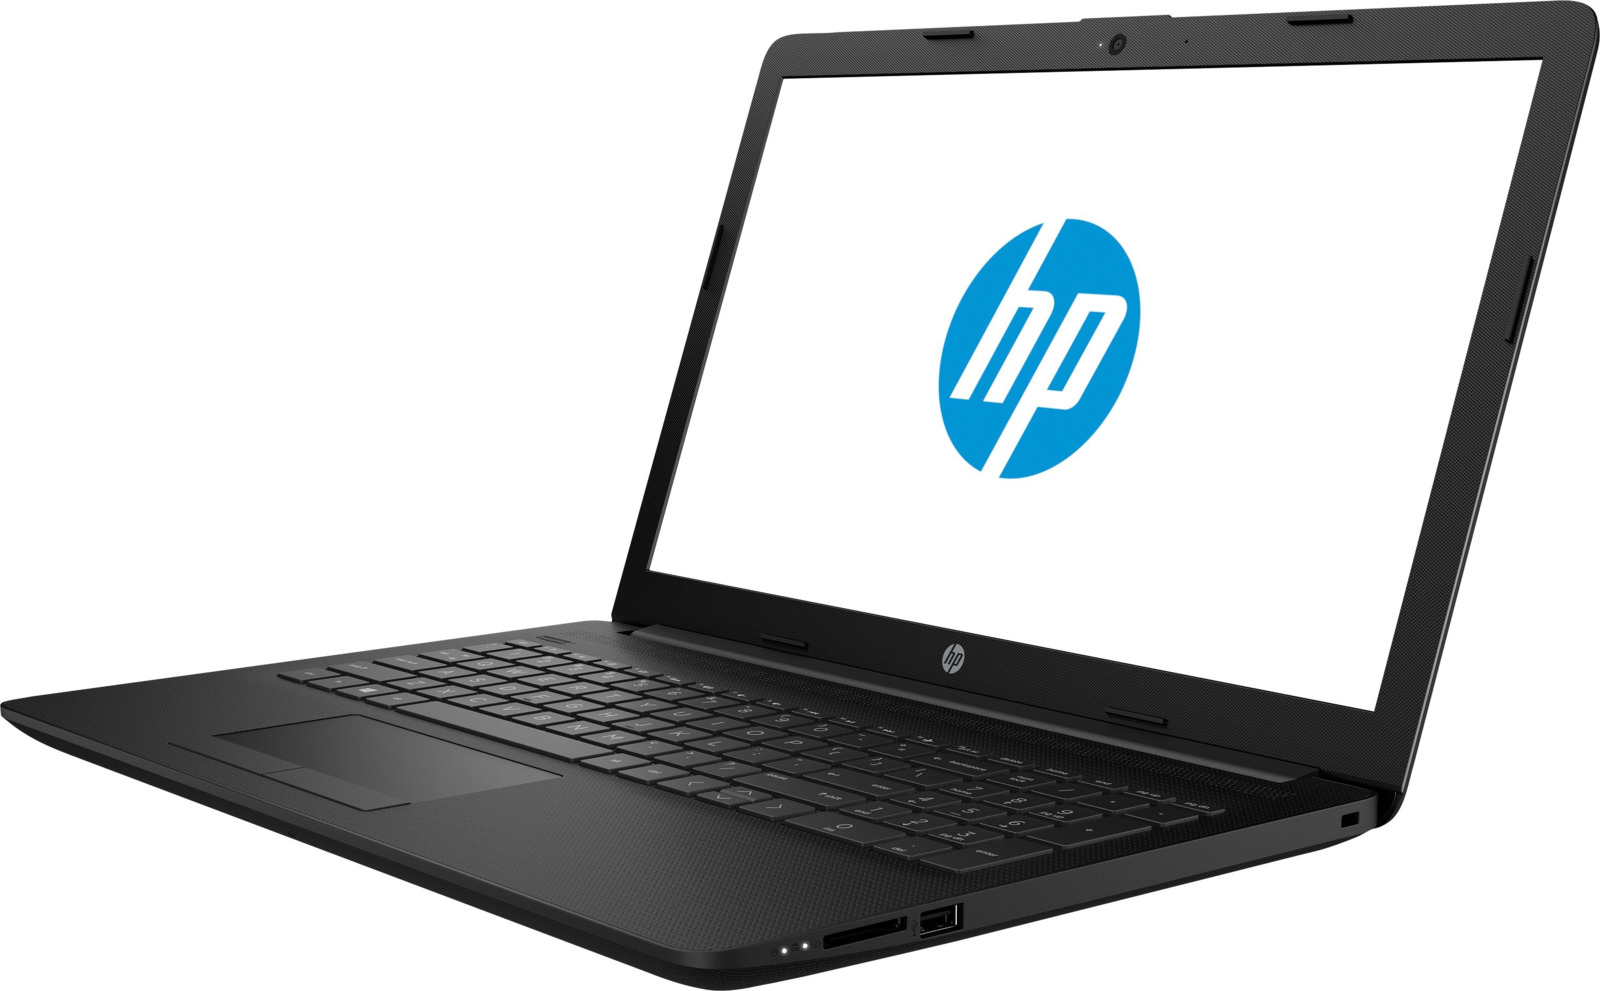 Ноутбук HP 15-db0094ur 4JW47EA, черный ноутбук hp 15 da0149ur